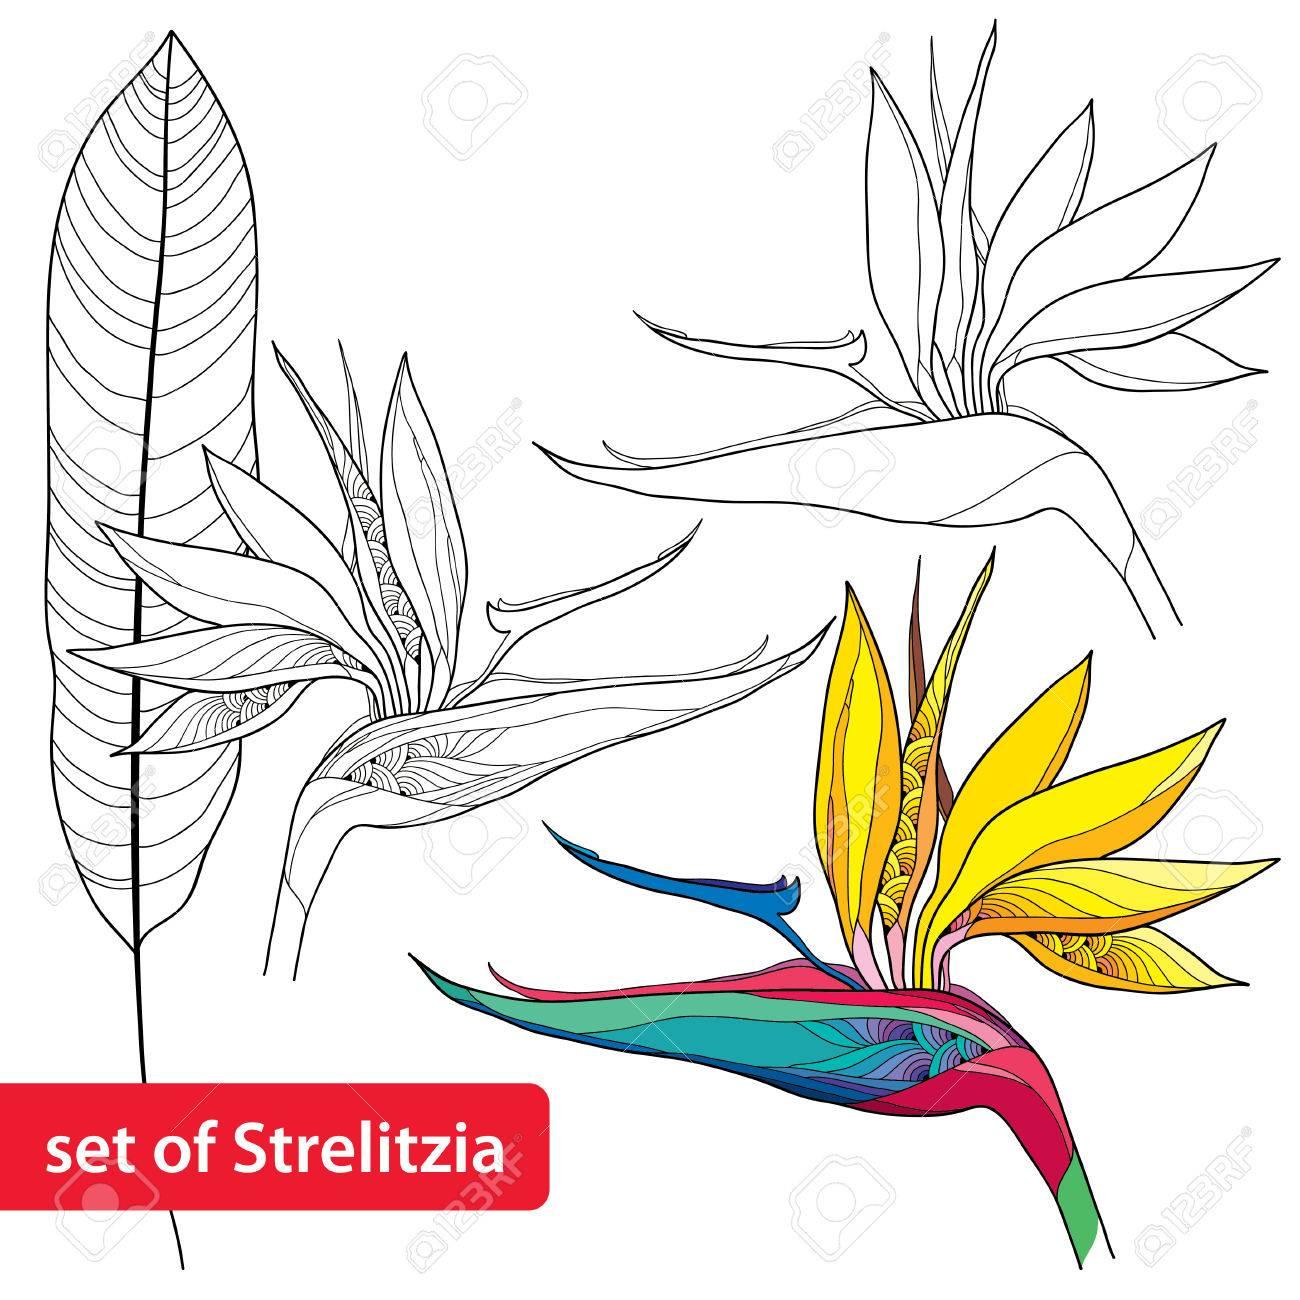 Set of strelitzia reginae or bird of paradise flower and leaf set of strelitzia reginae or bird of paradise flower and leaf isolated on white background buycottarizona